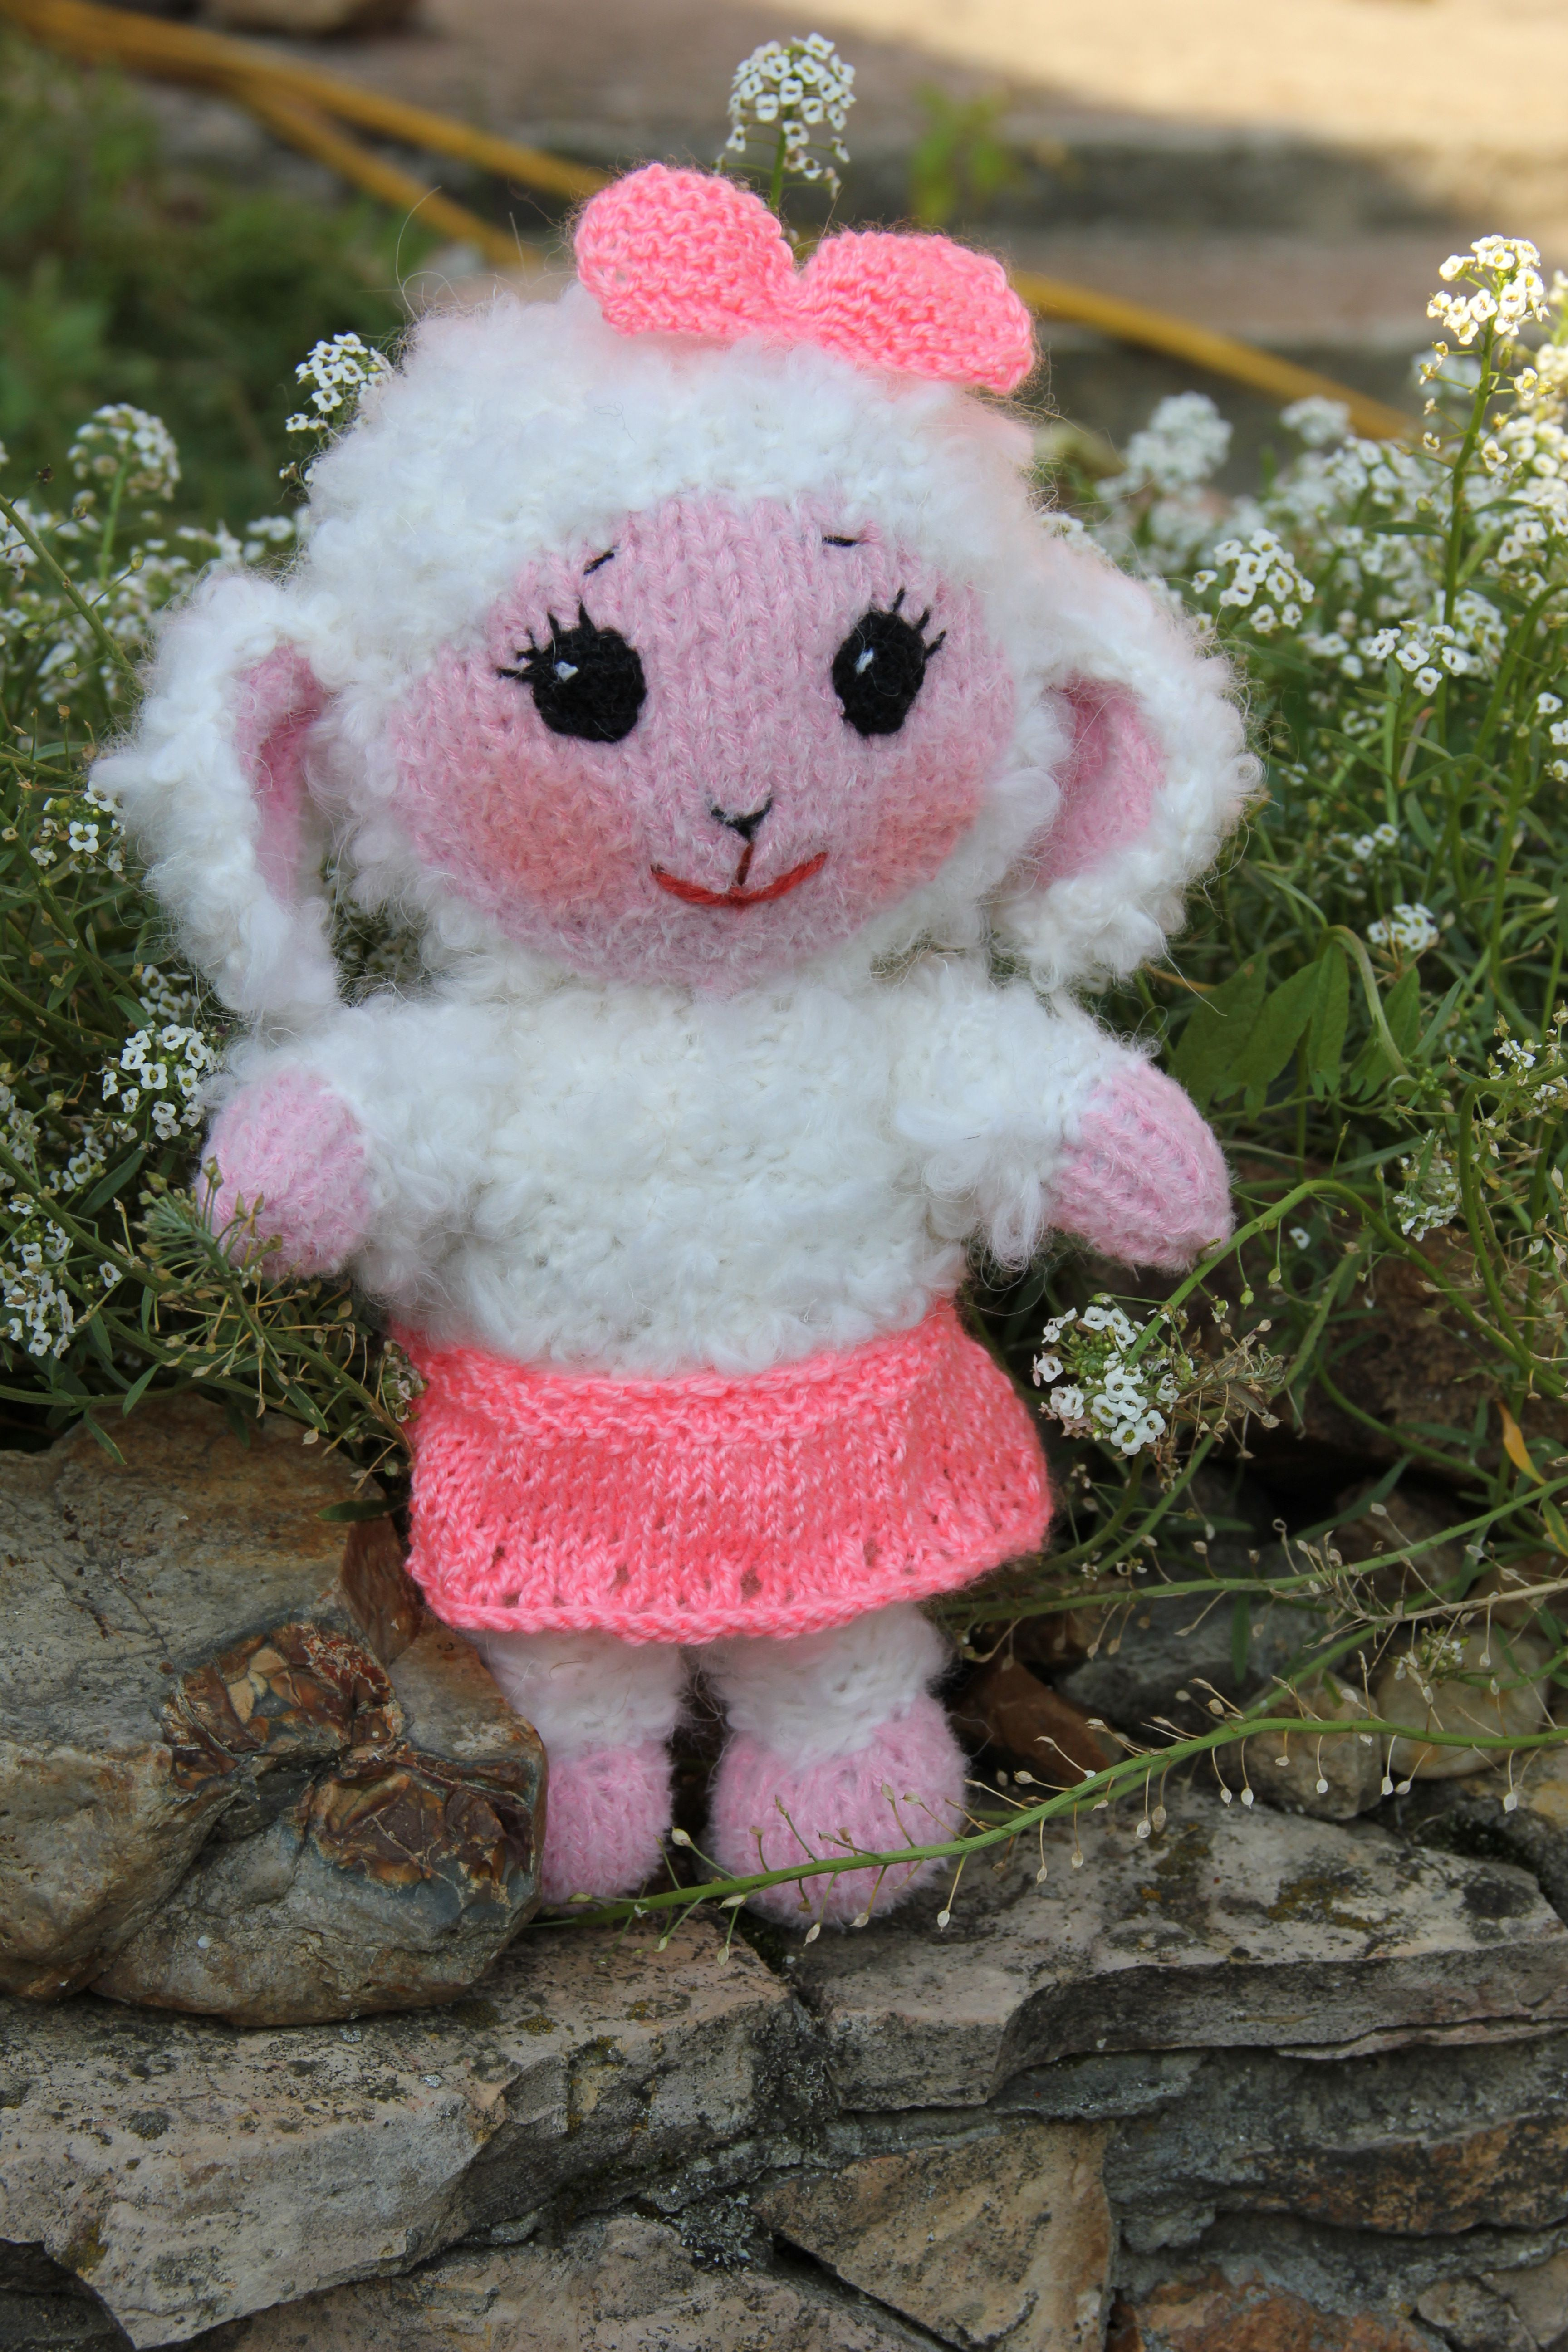 Cute lamb stuffed animal Baby girl gift lambKnitted plush